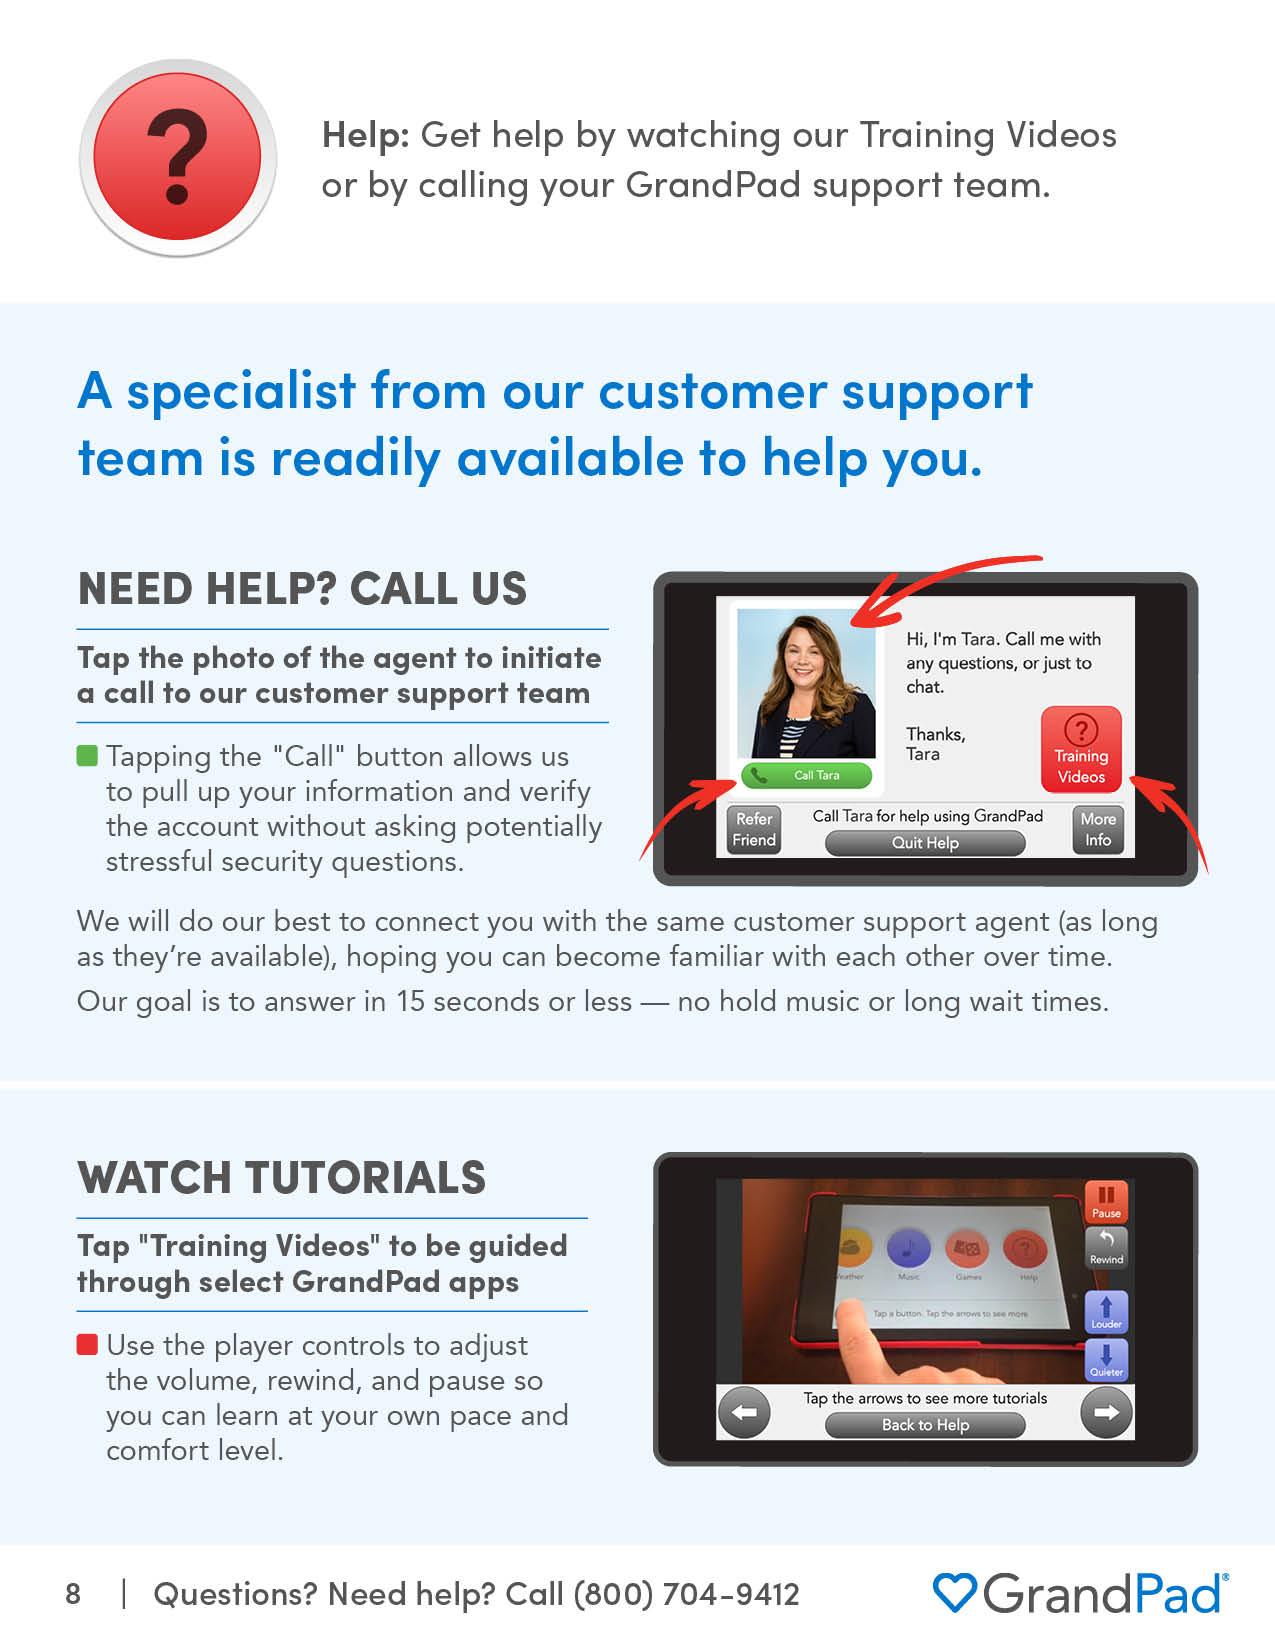 Instruction on using Help